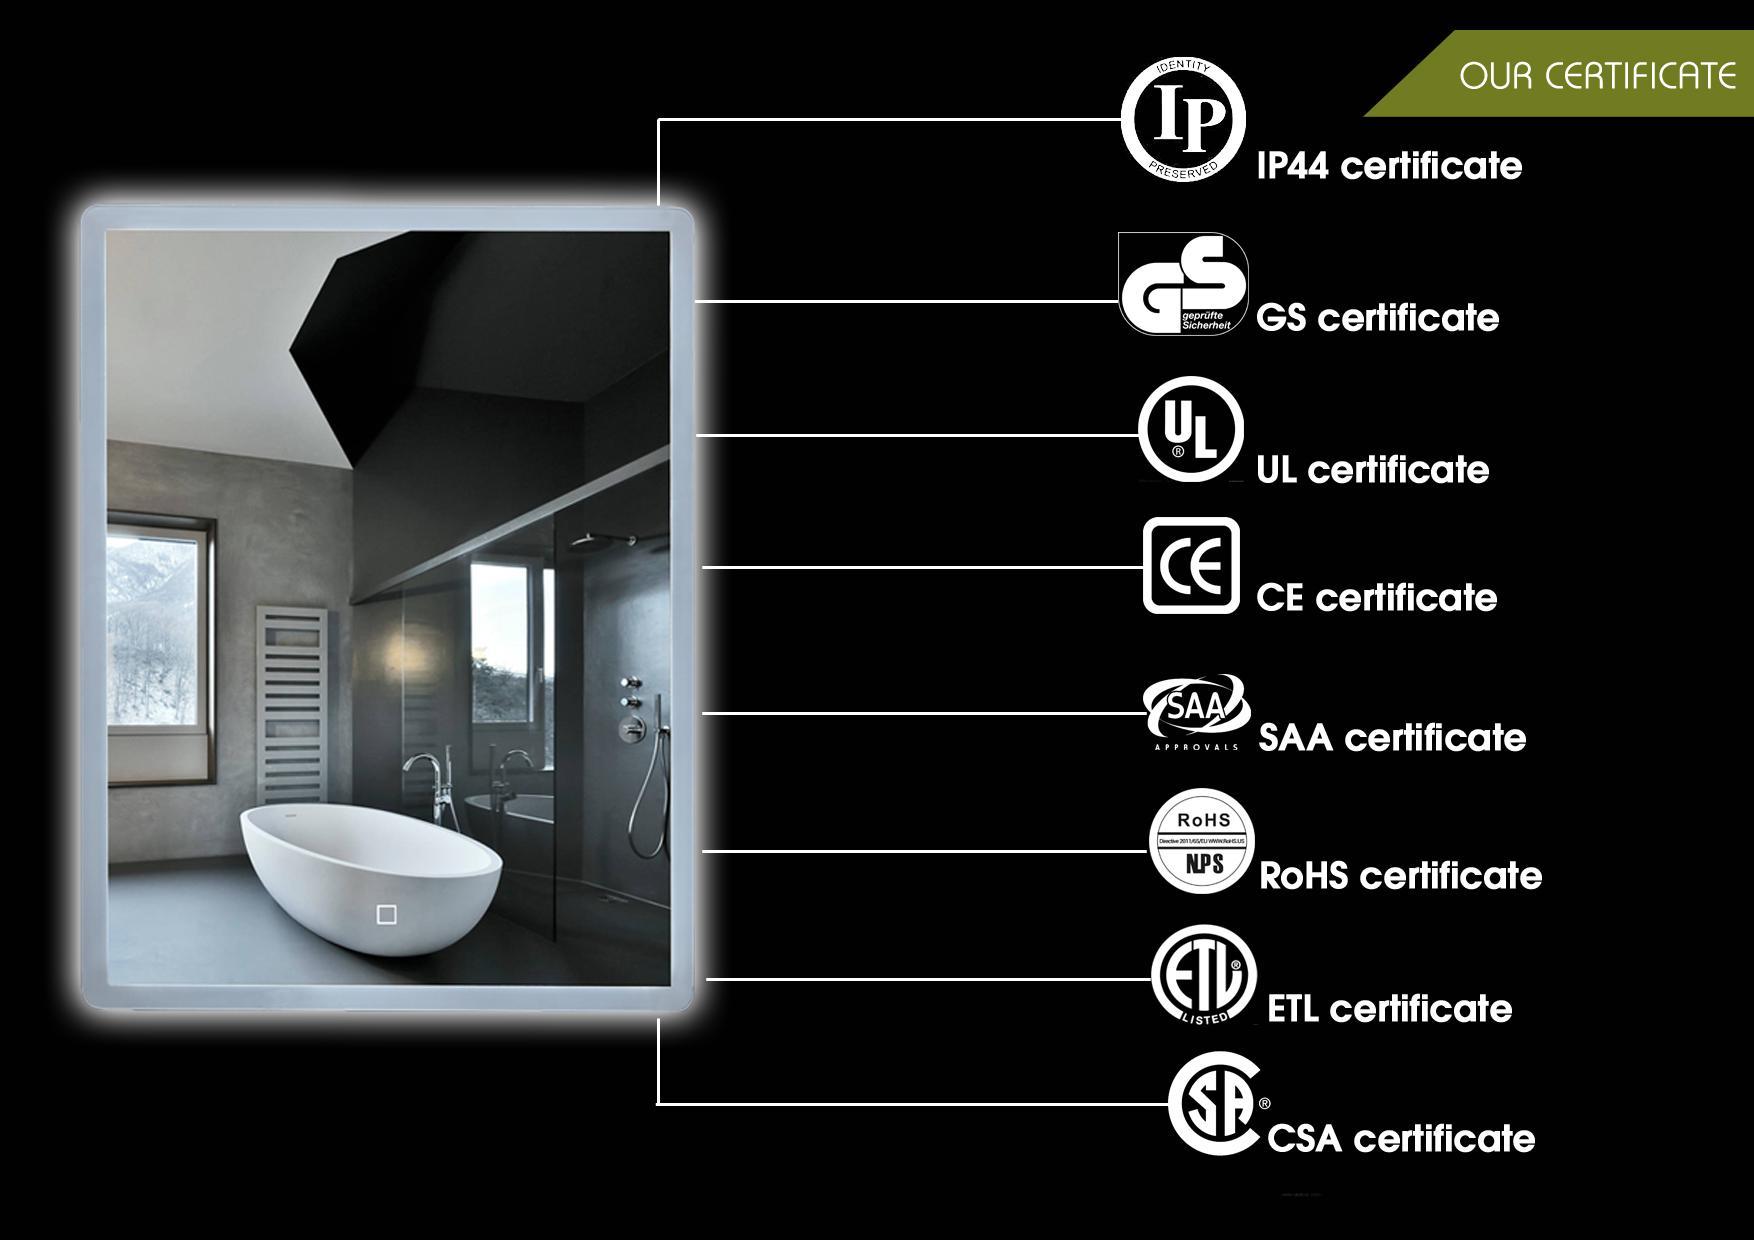 mirror-certification.jpg